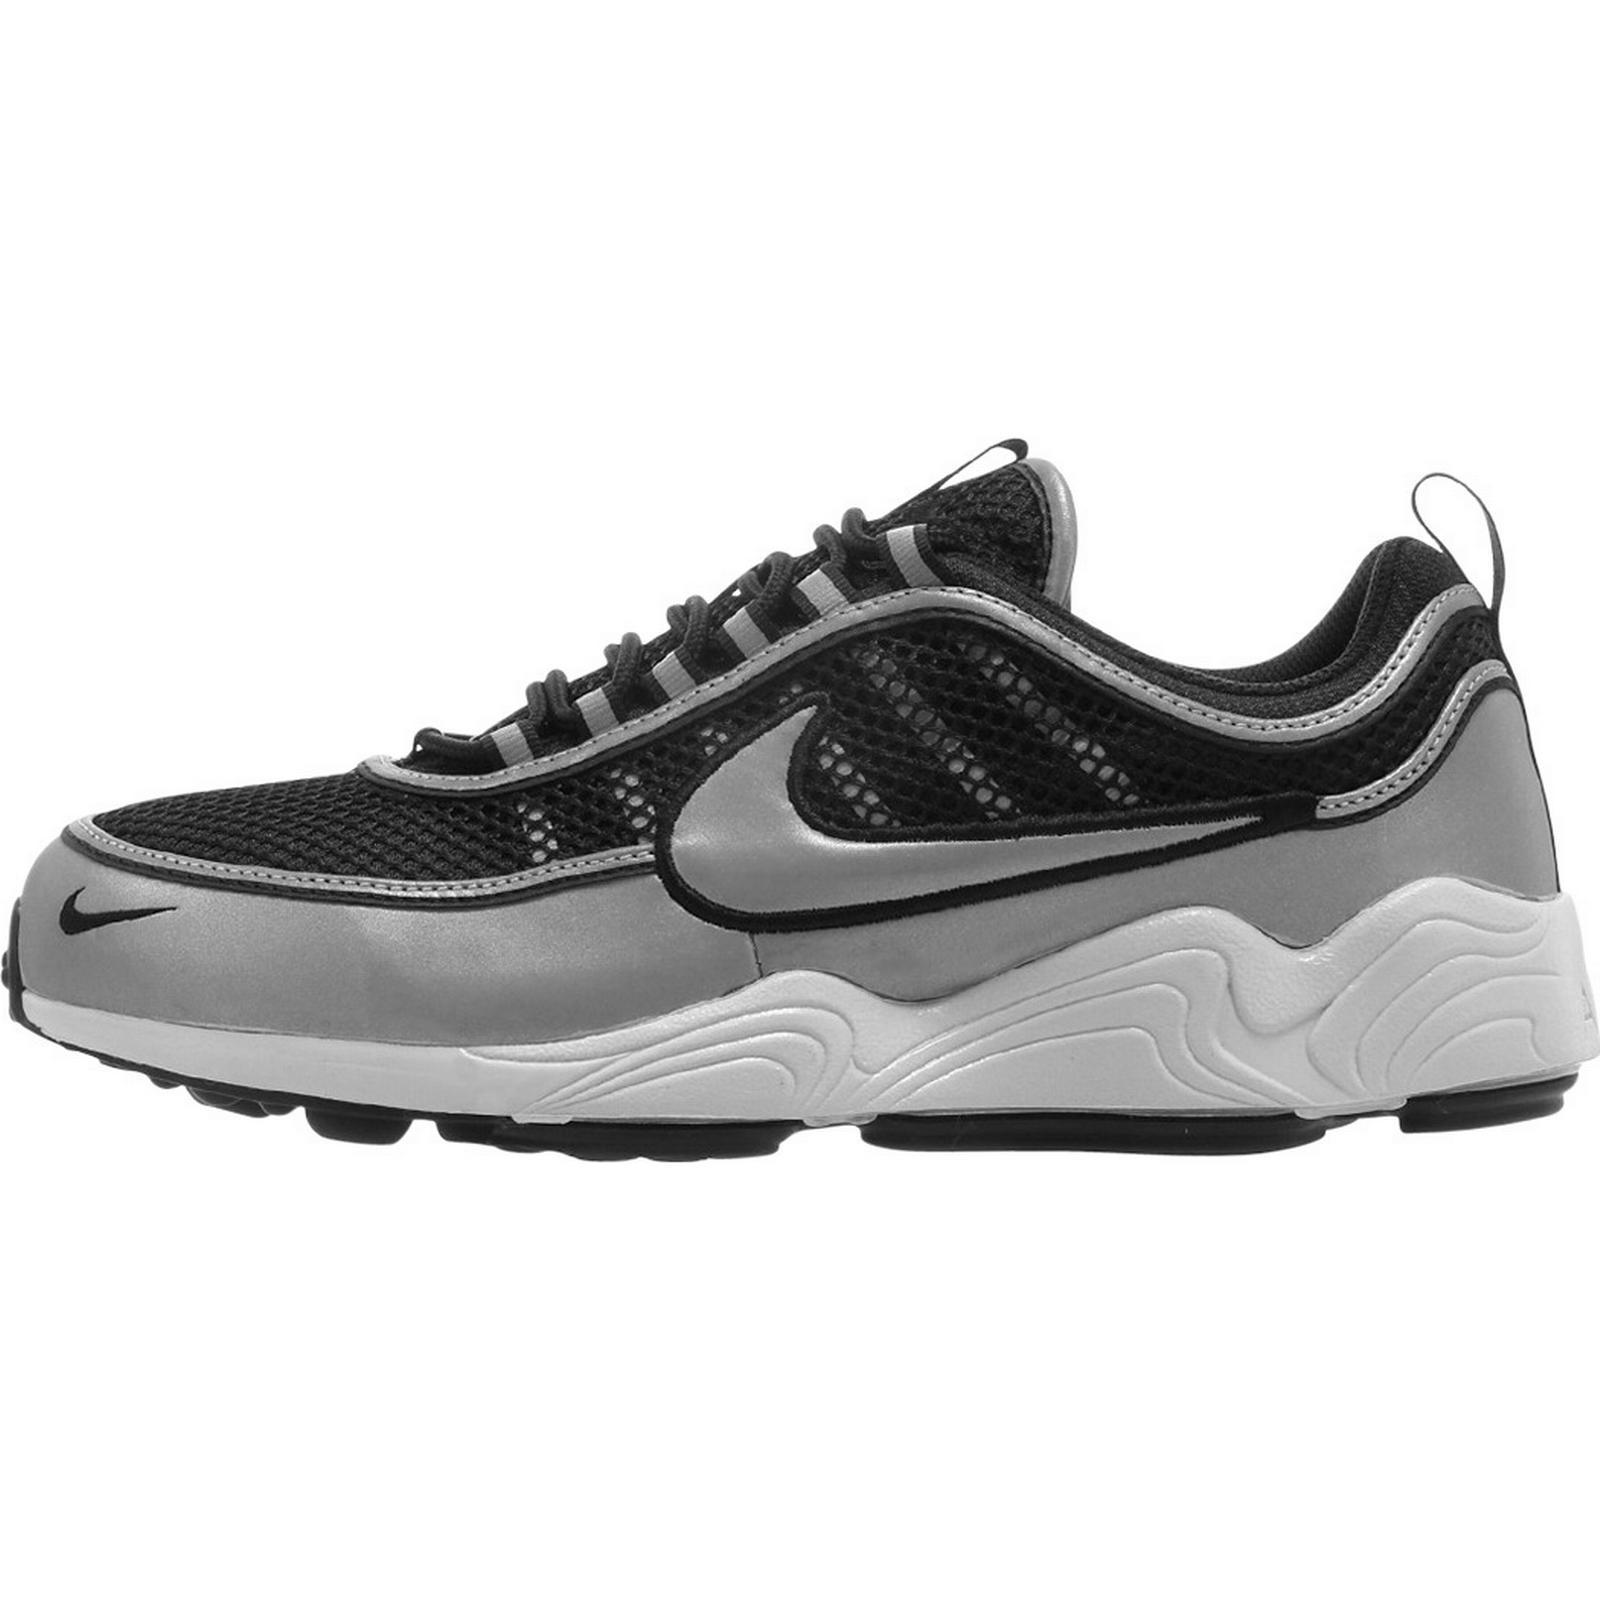 Nike Zoom Air Zoom Nike Spiridon '16 - Zwart ef581e